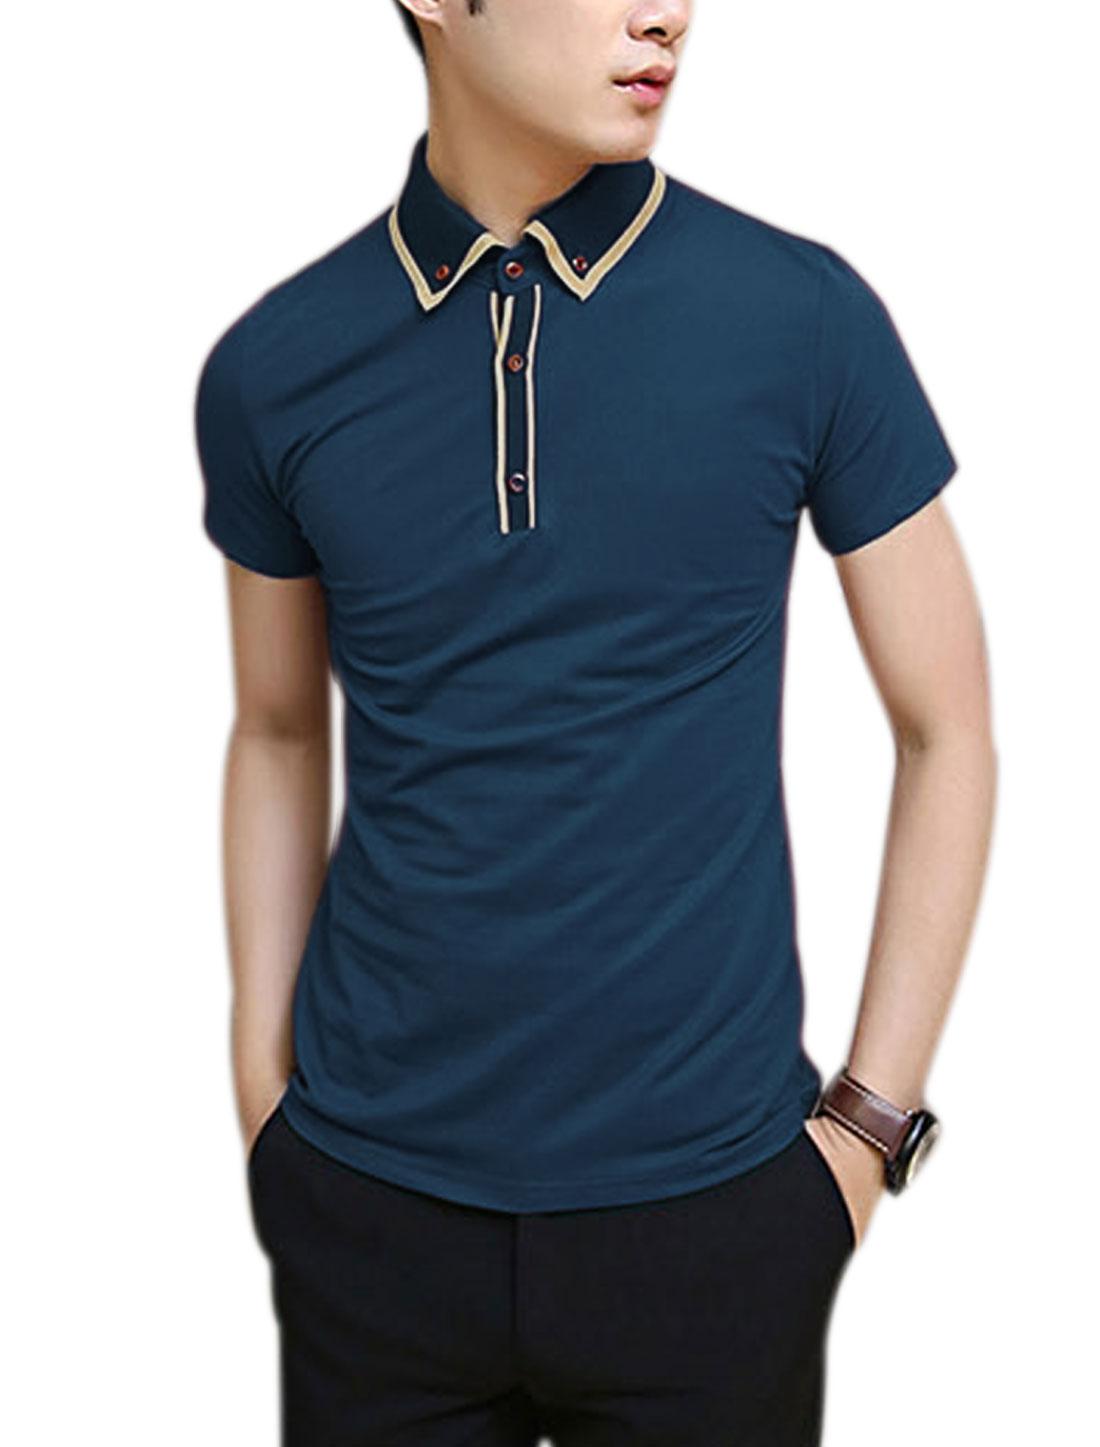 Men 1/4 Placket Stripes Line Detail Button Down Polo Shirt Navy Blue M